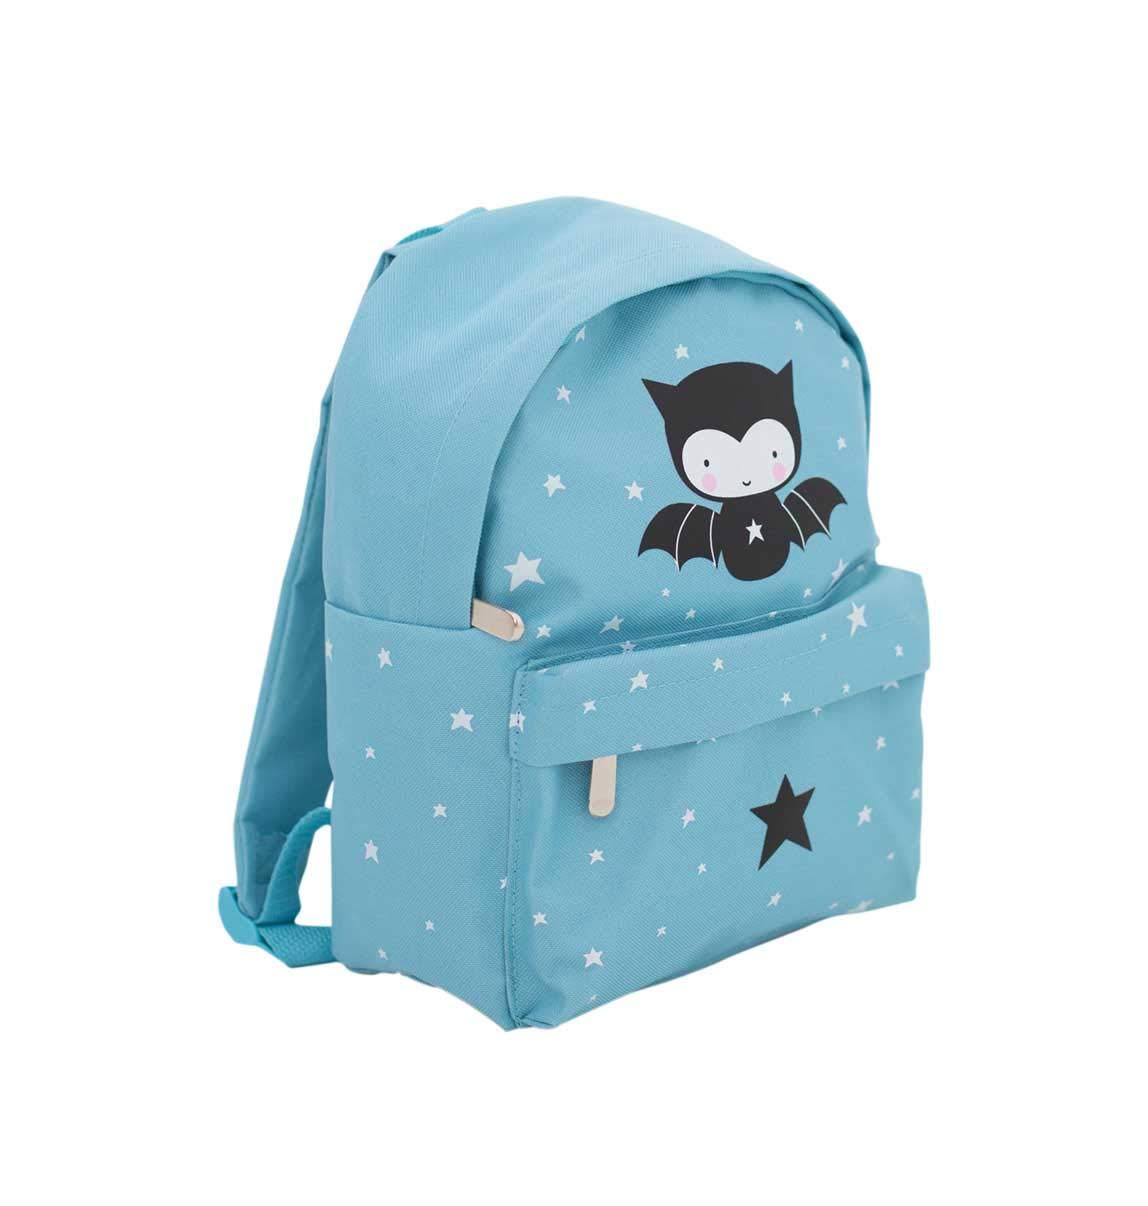 Mini Bat Backpack - A Little Lovely Company LL-BPBA007